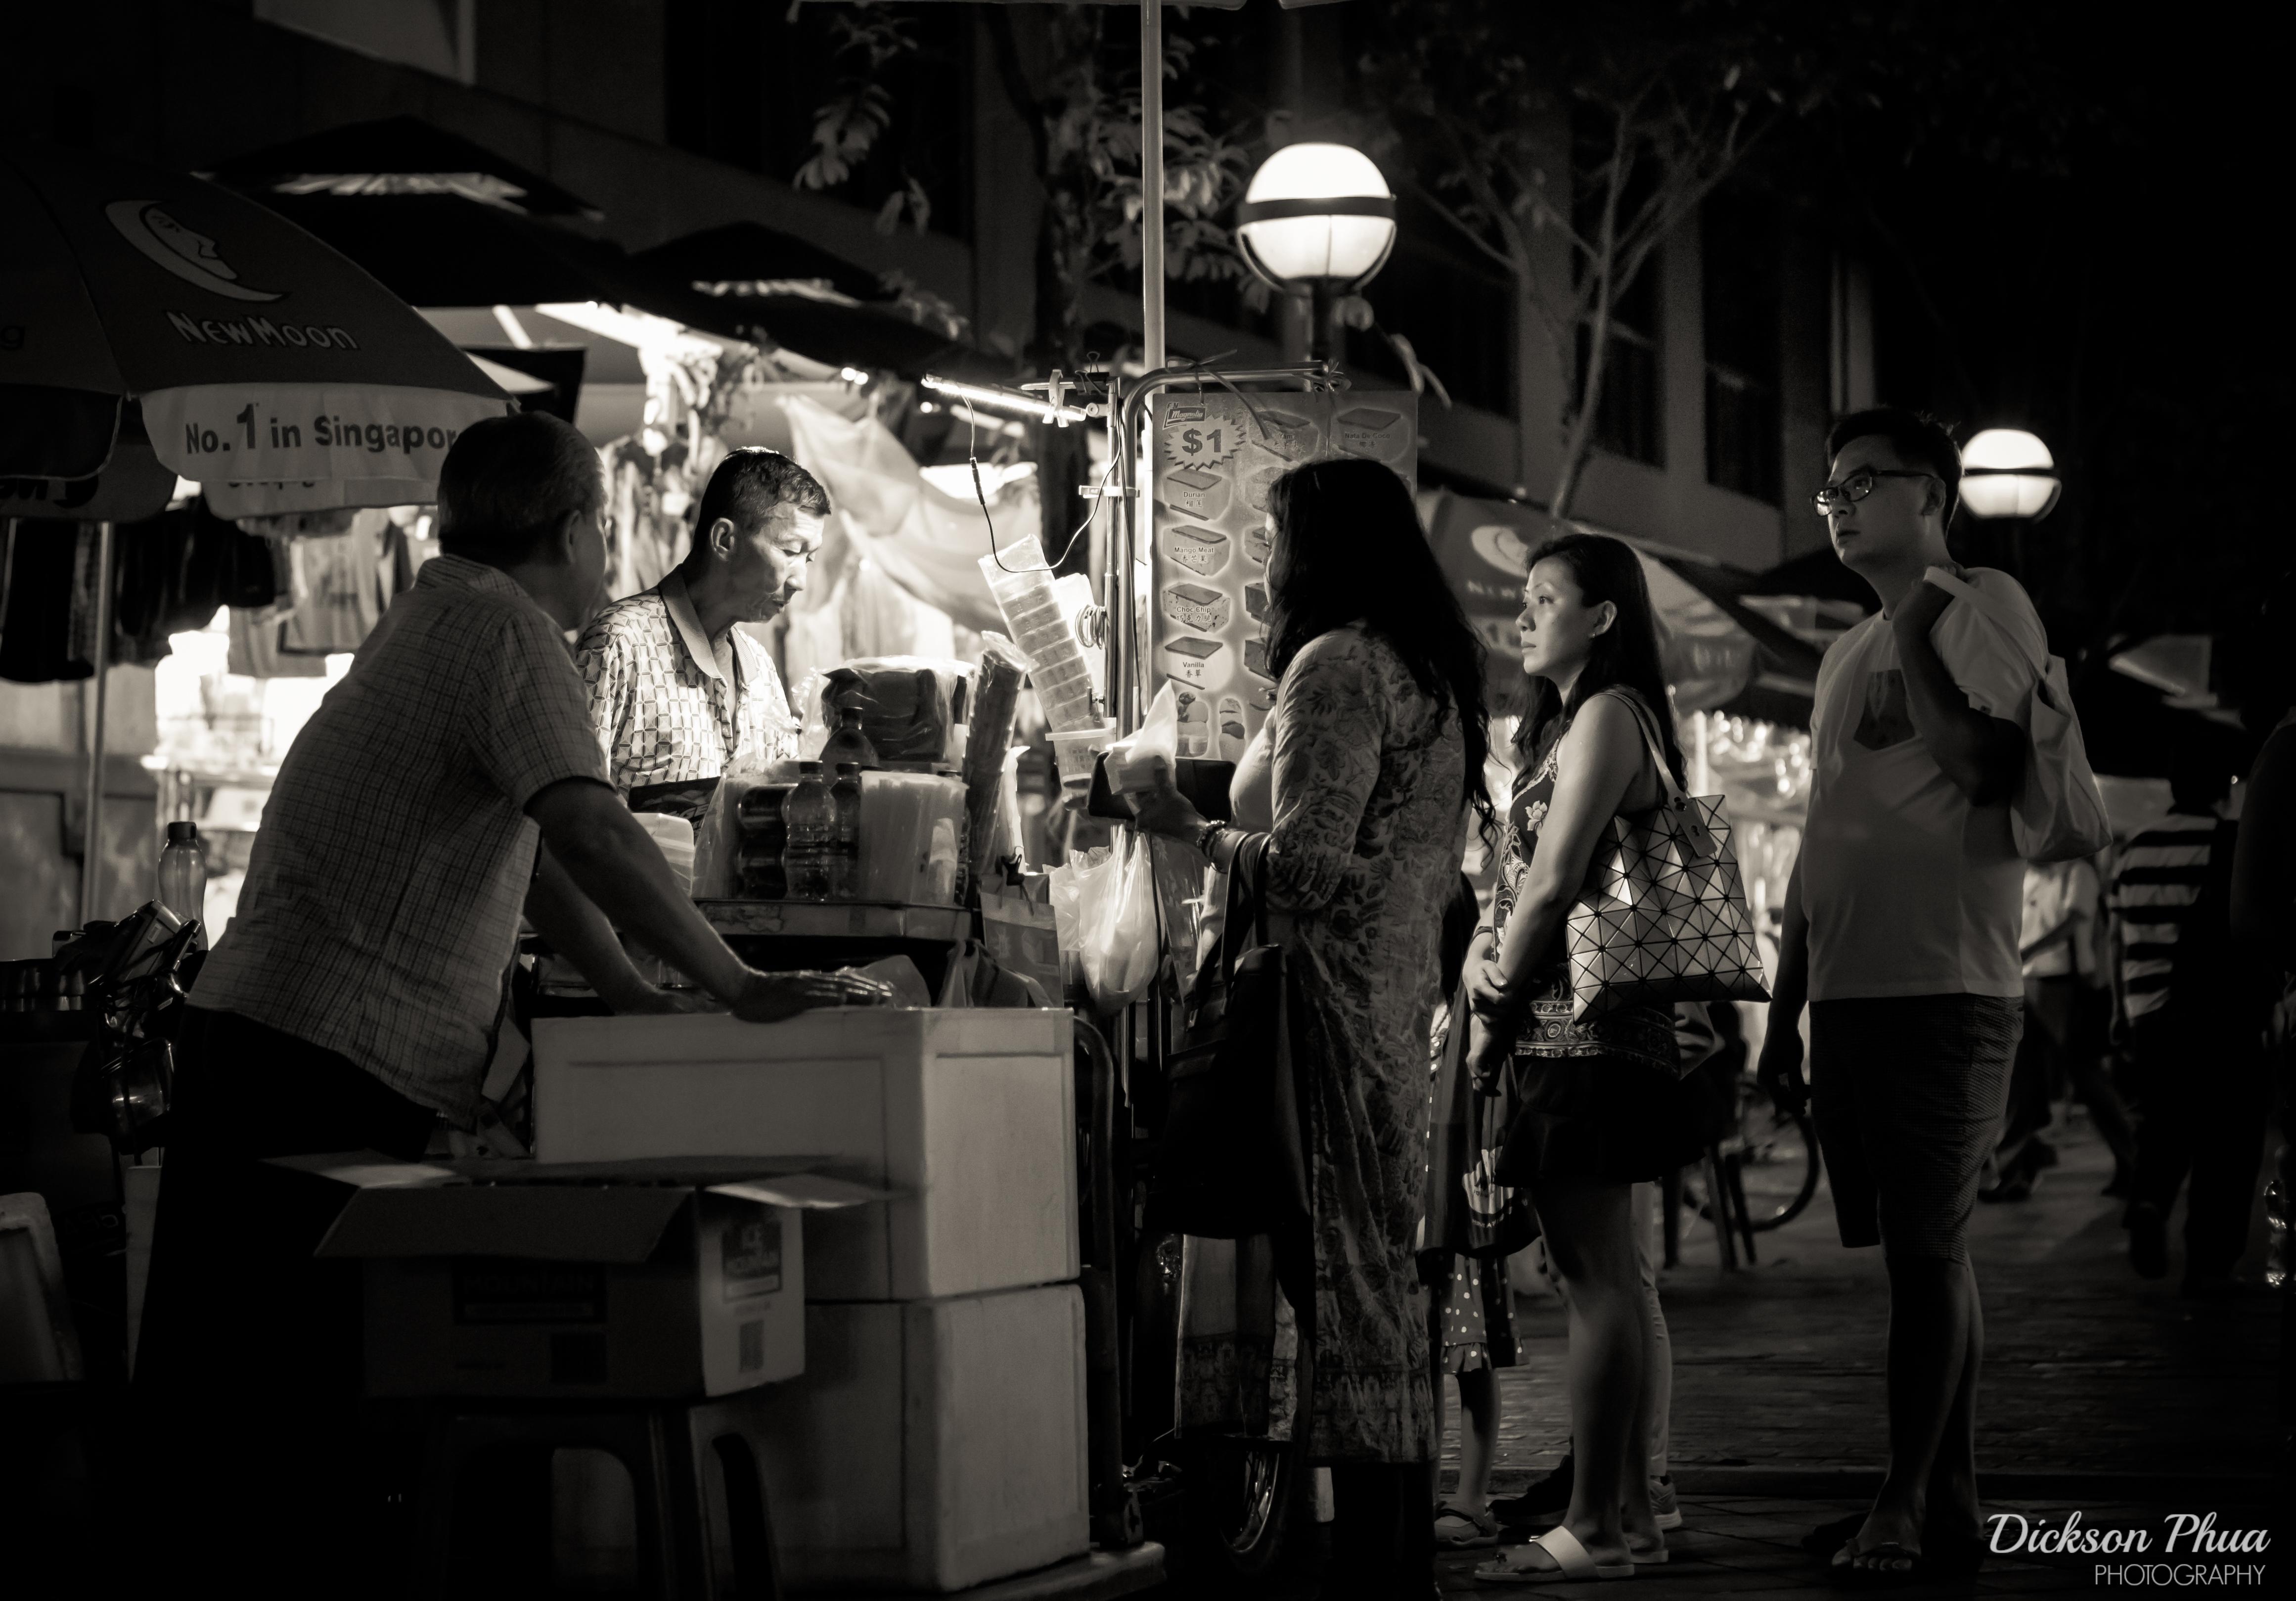 Wallpaper people eyes street night singapore asia asian field road music ice musician sepia stop bokeh cream b waiting entertainment